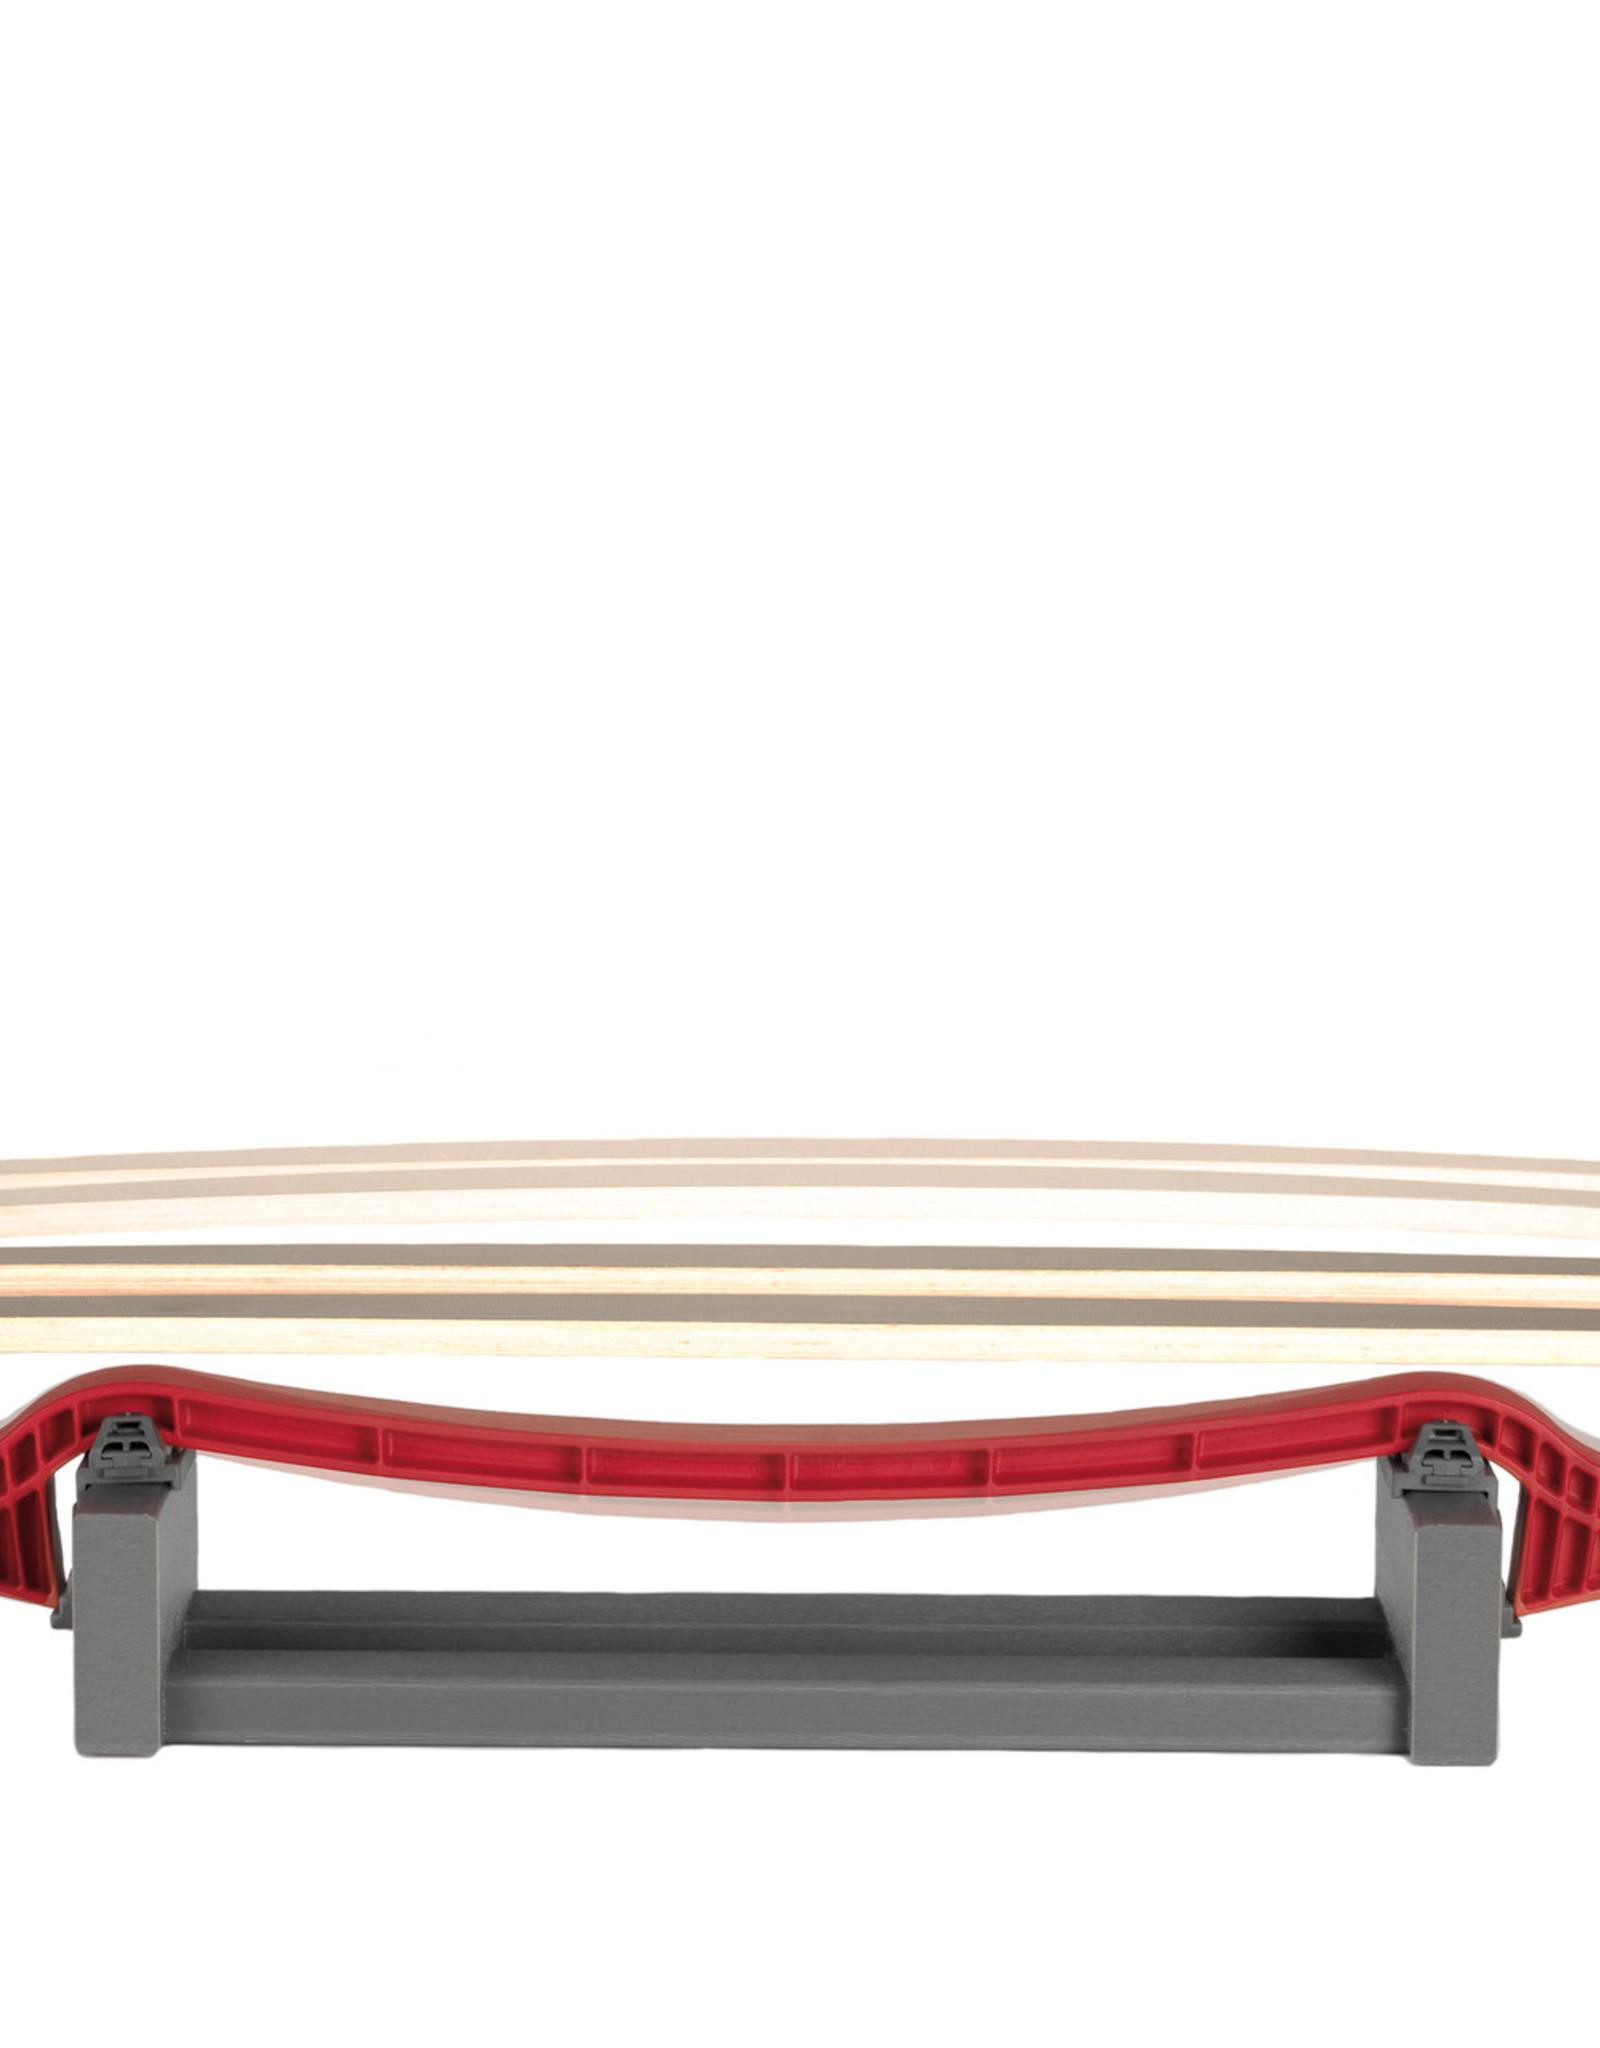 Swissflex Lattenbodem Uni 20-35RF hoofd, rug (motor) & voet